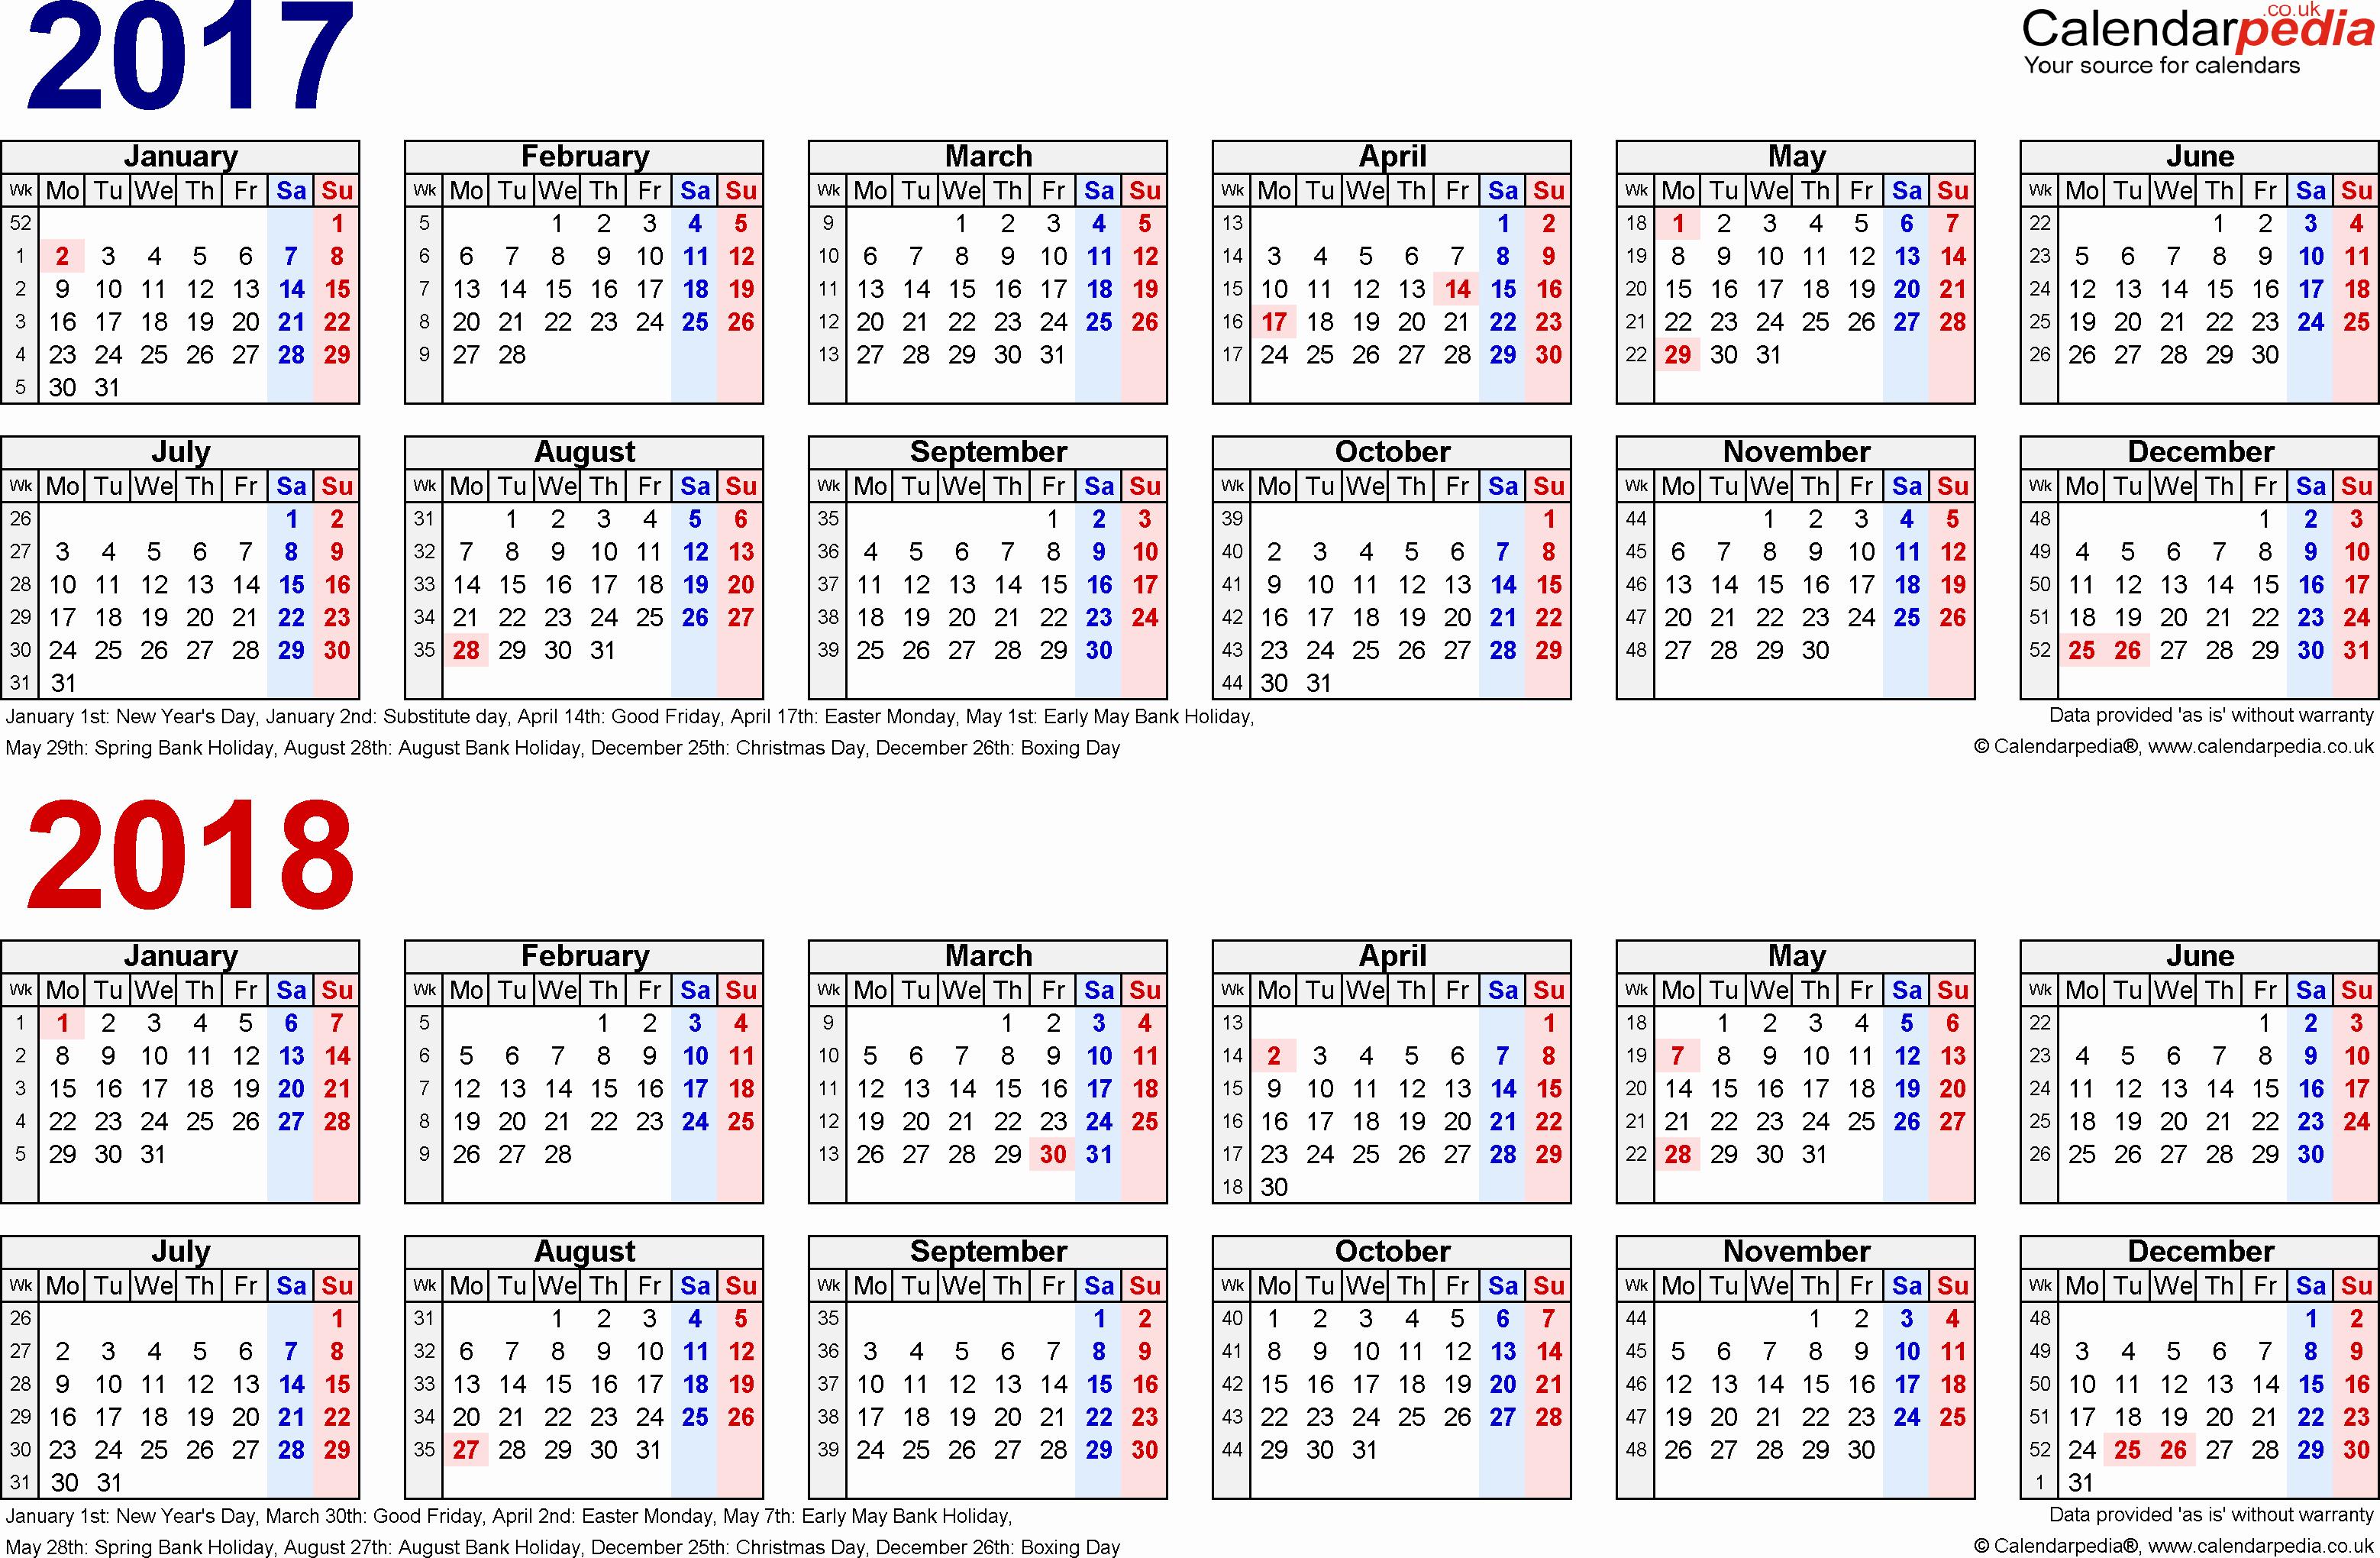 Microsoft Word 2018 Calendar Templates Lovely 2018 Calendar Word